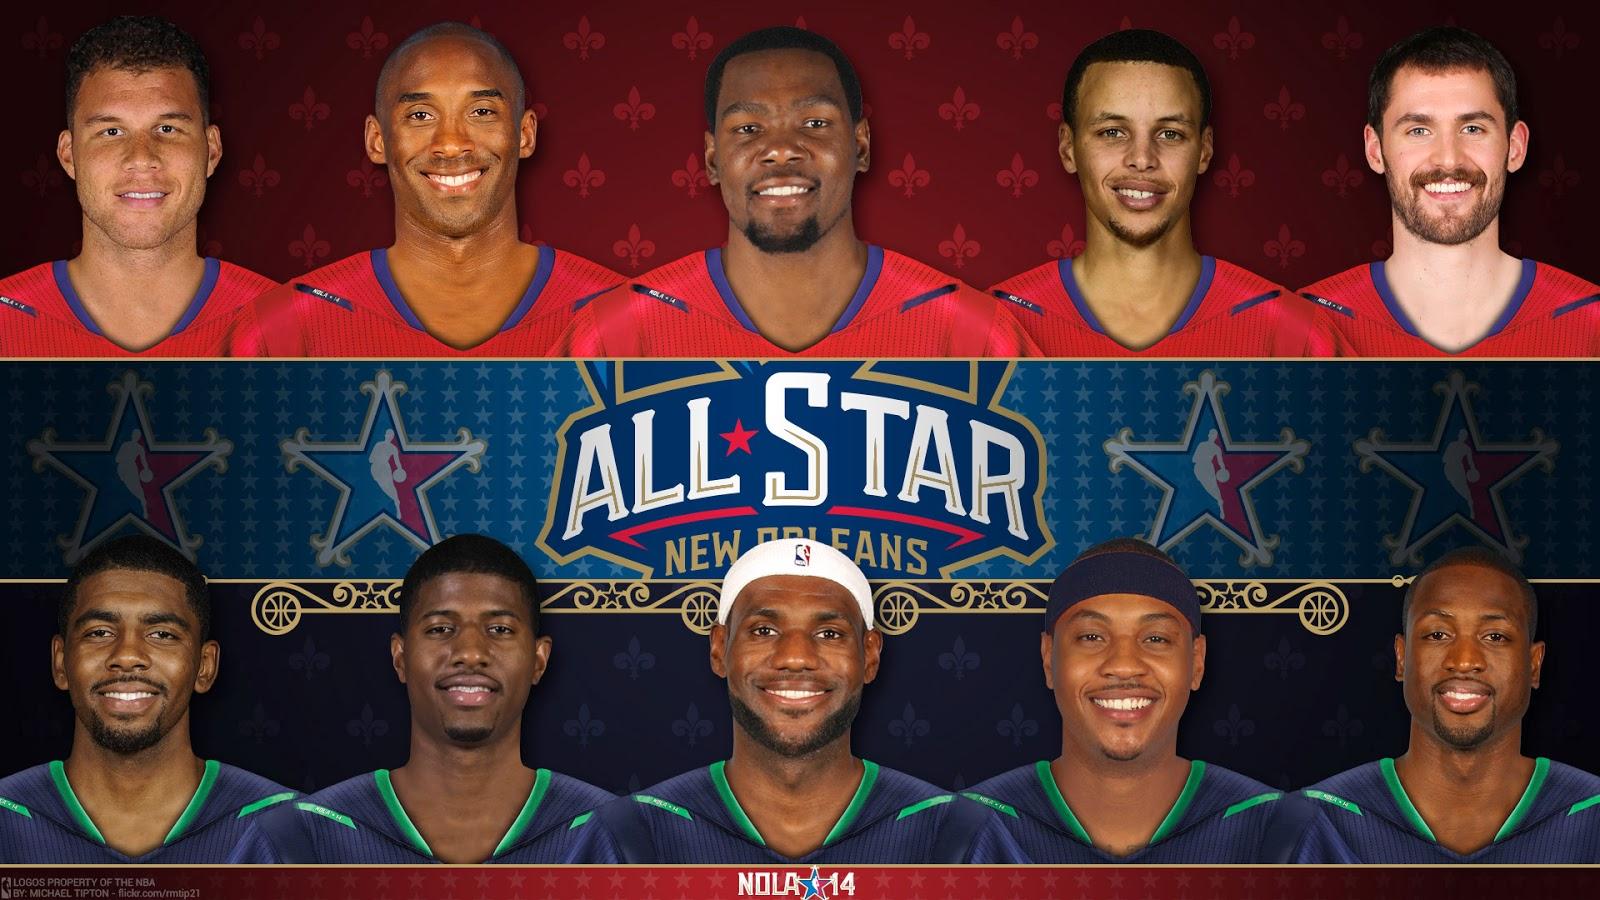 2014 NBA All-Star Game - Wikipedia